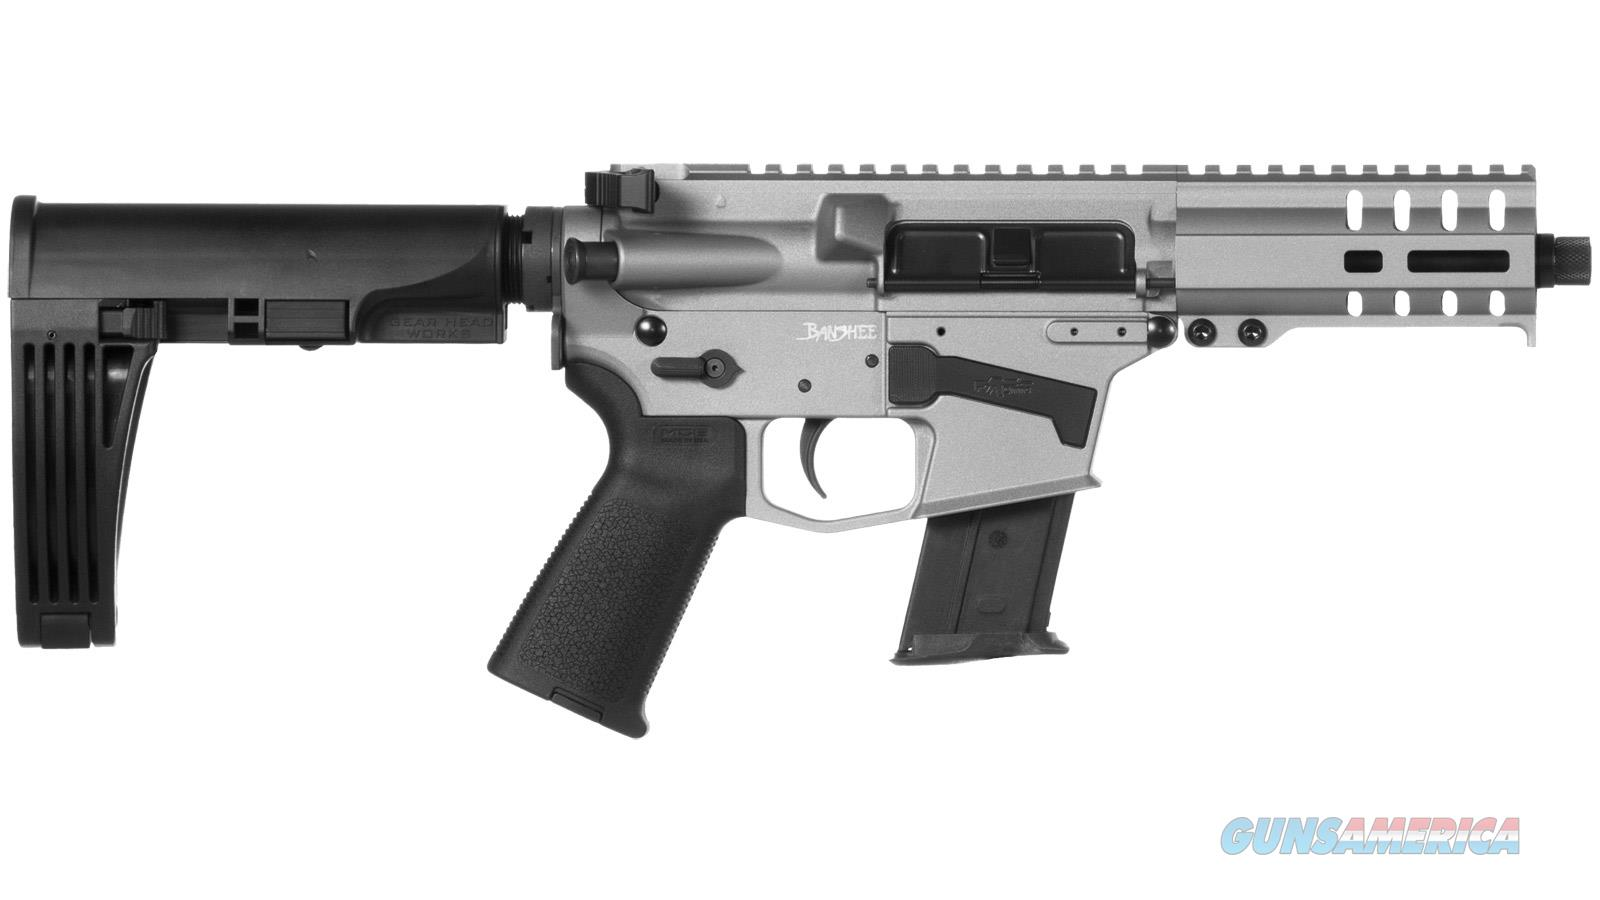 "Cmmg Banshee Pistol 5.7X28mm 5"" 20Rd Titanium Mlok Brace 57A18CDTI  Guns > Pistols > C Misc Pistols"